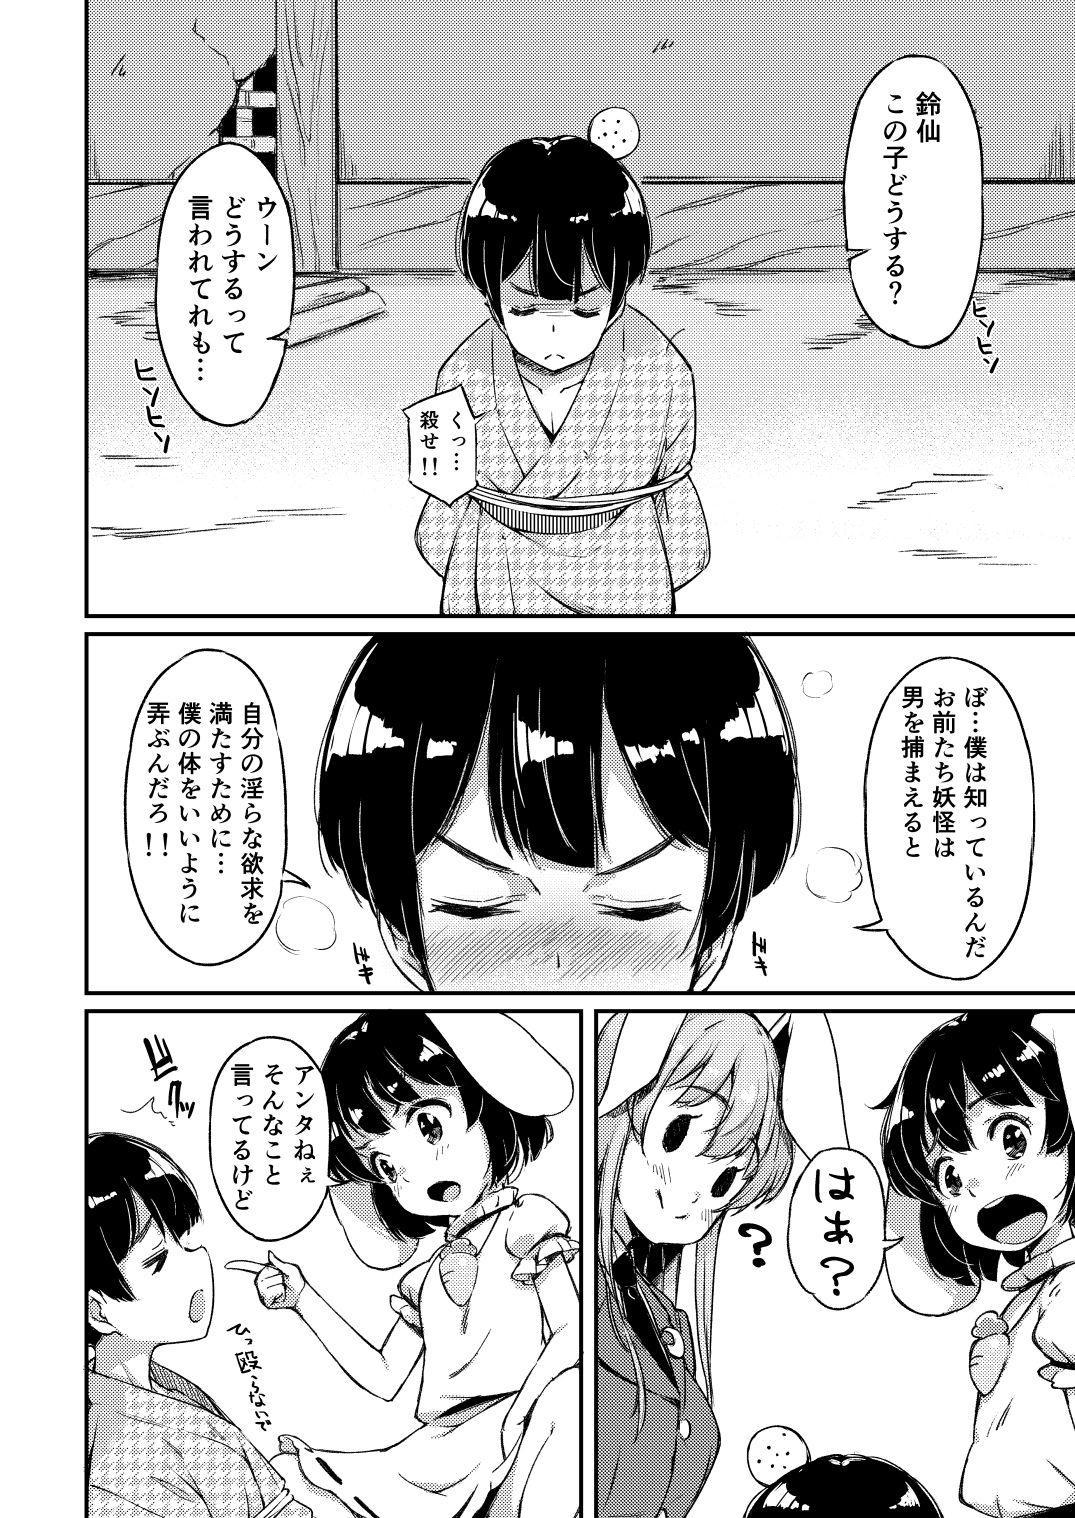 UdoTewi no, Gochisousama! 2